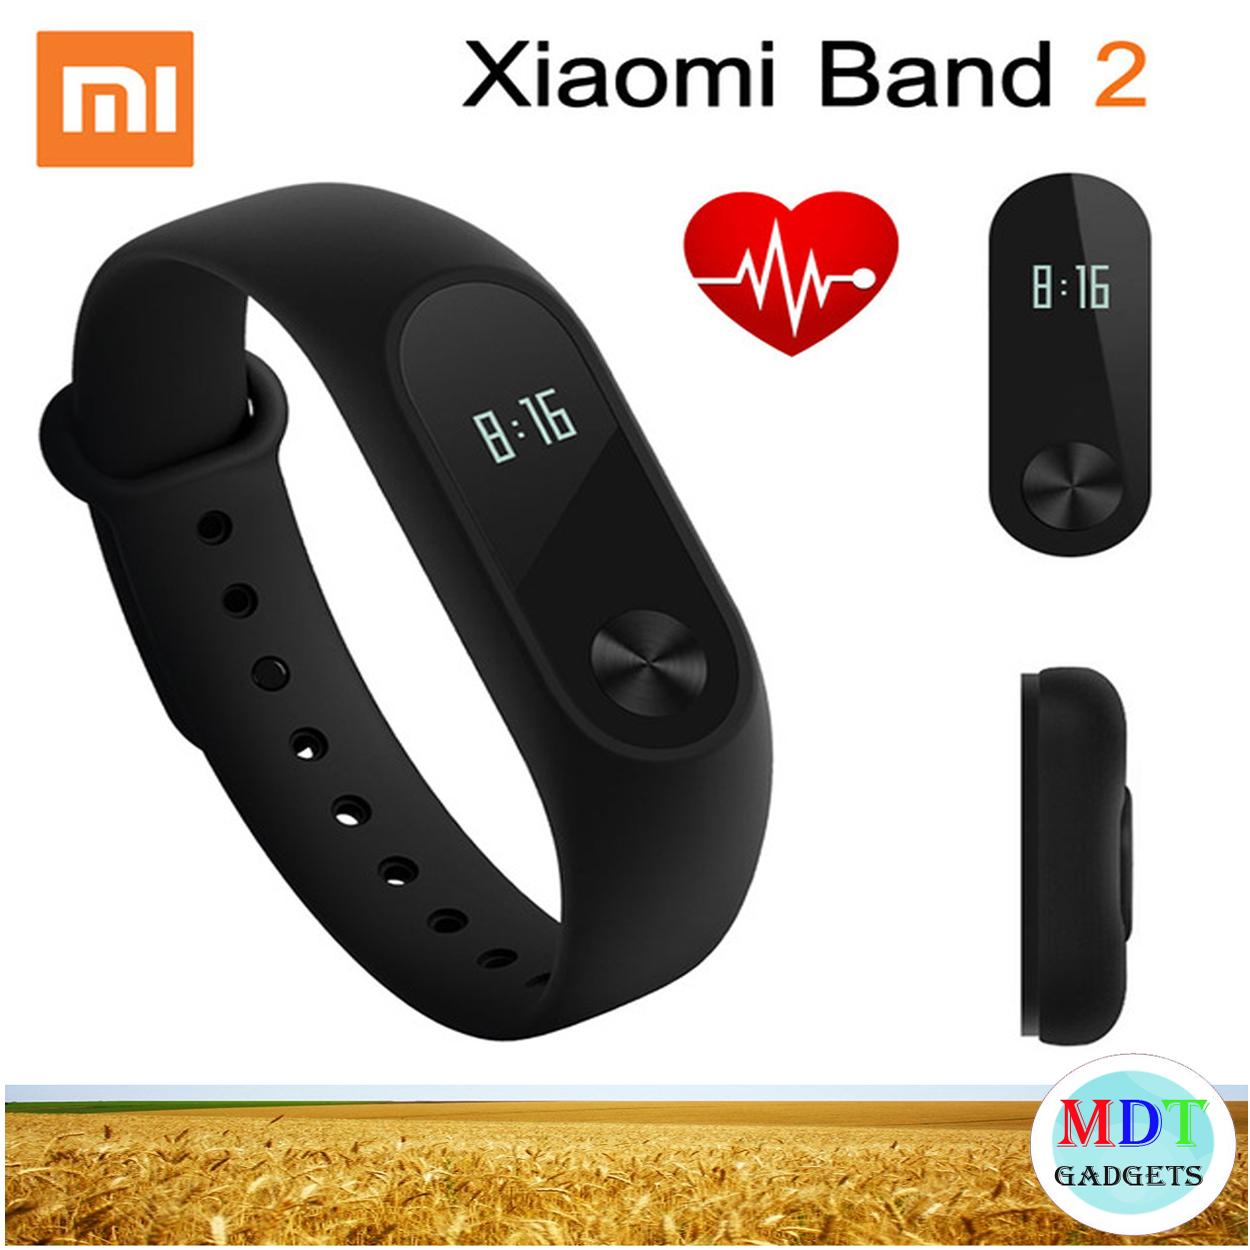 Xiaomi Mi Band 2 Smart Heart Rate Monitor Fitness Tracker (Black)